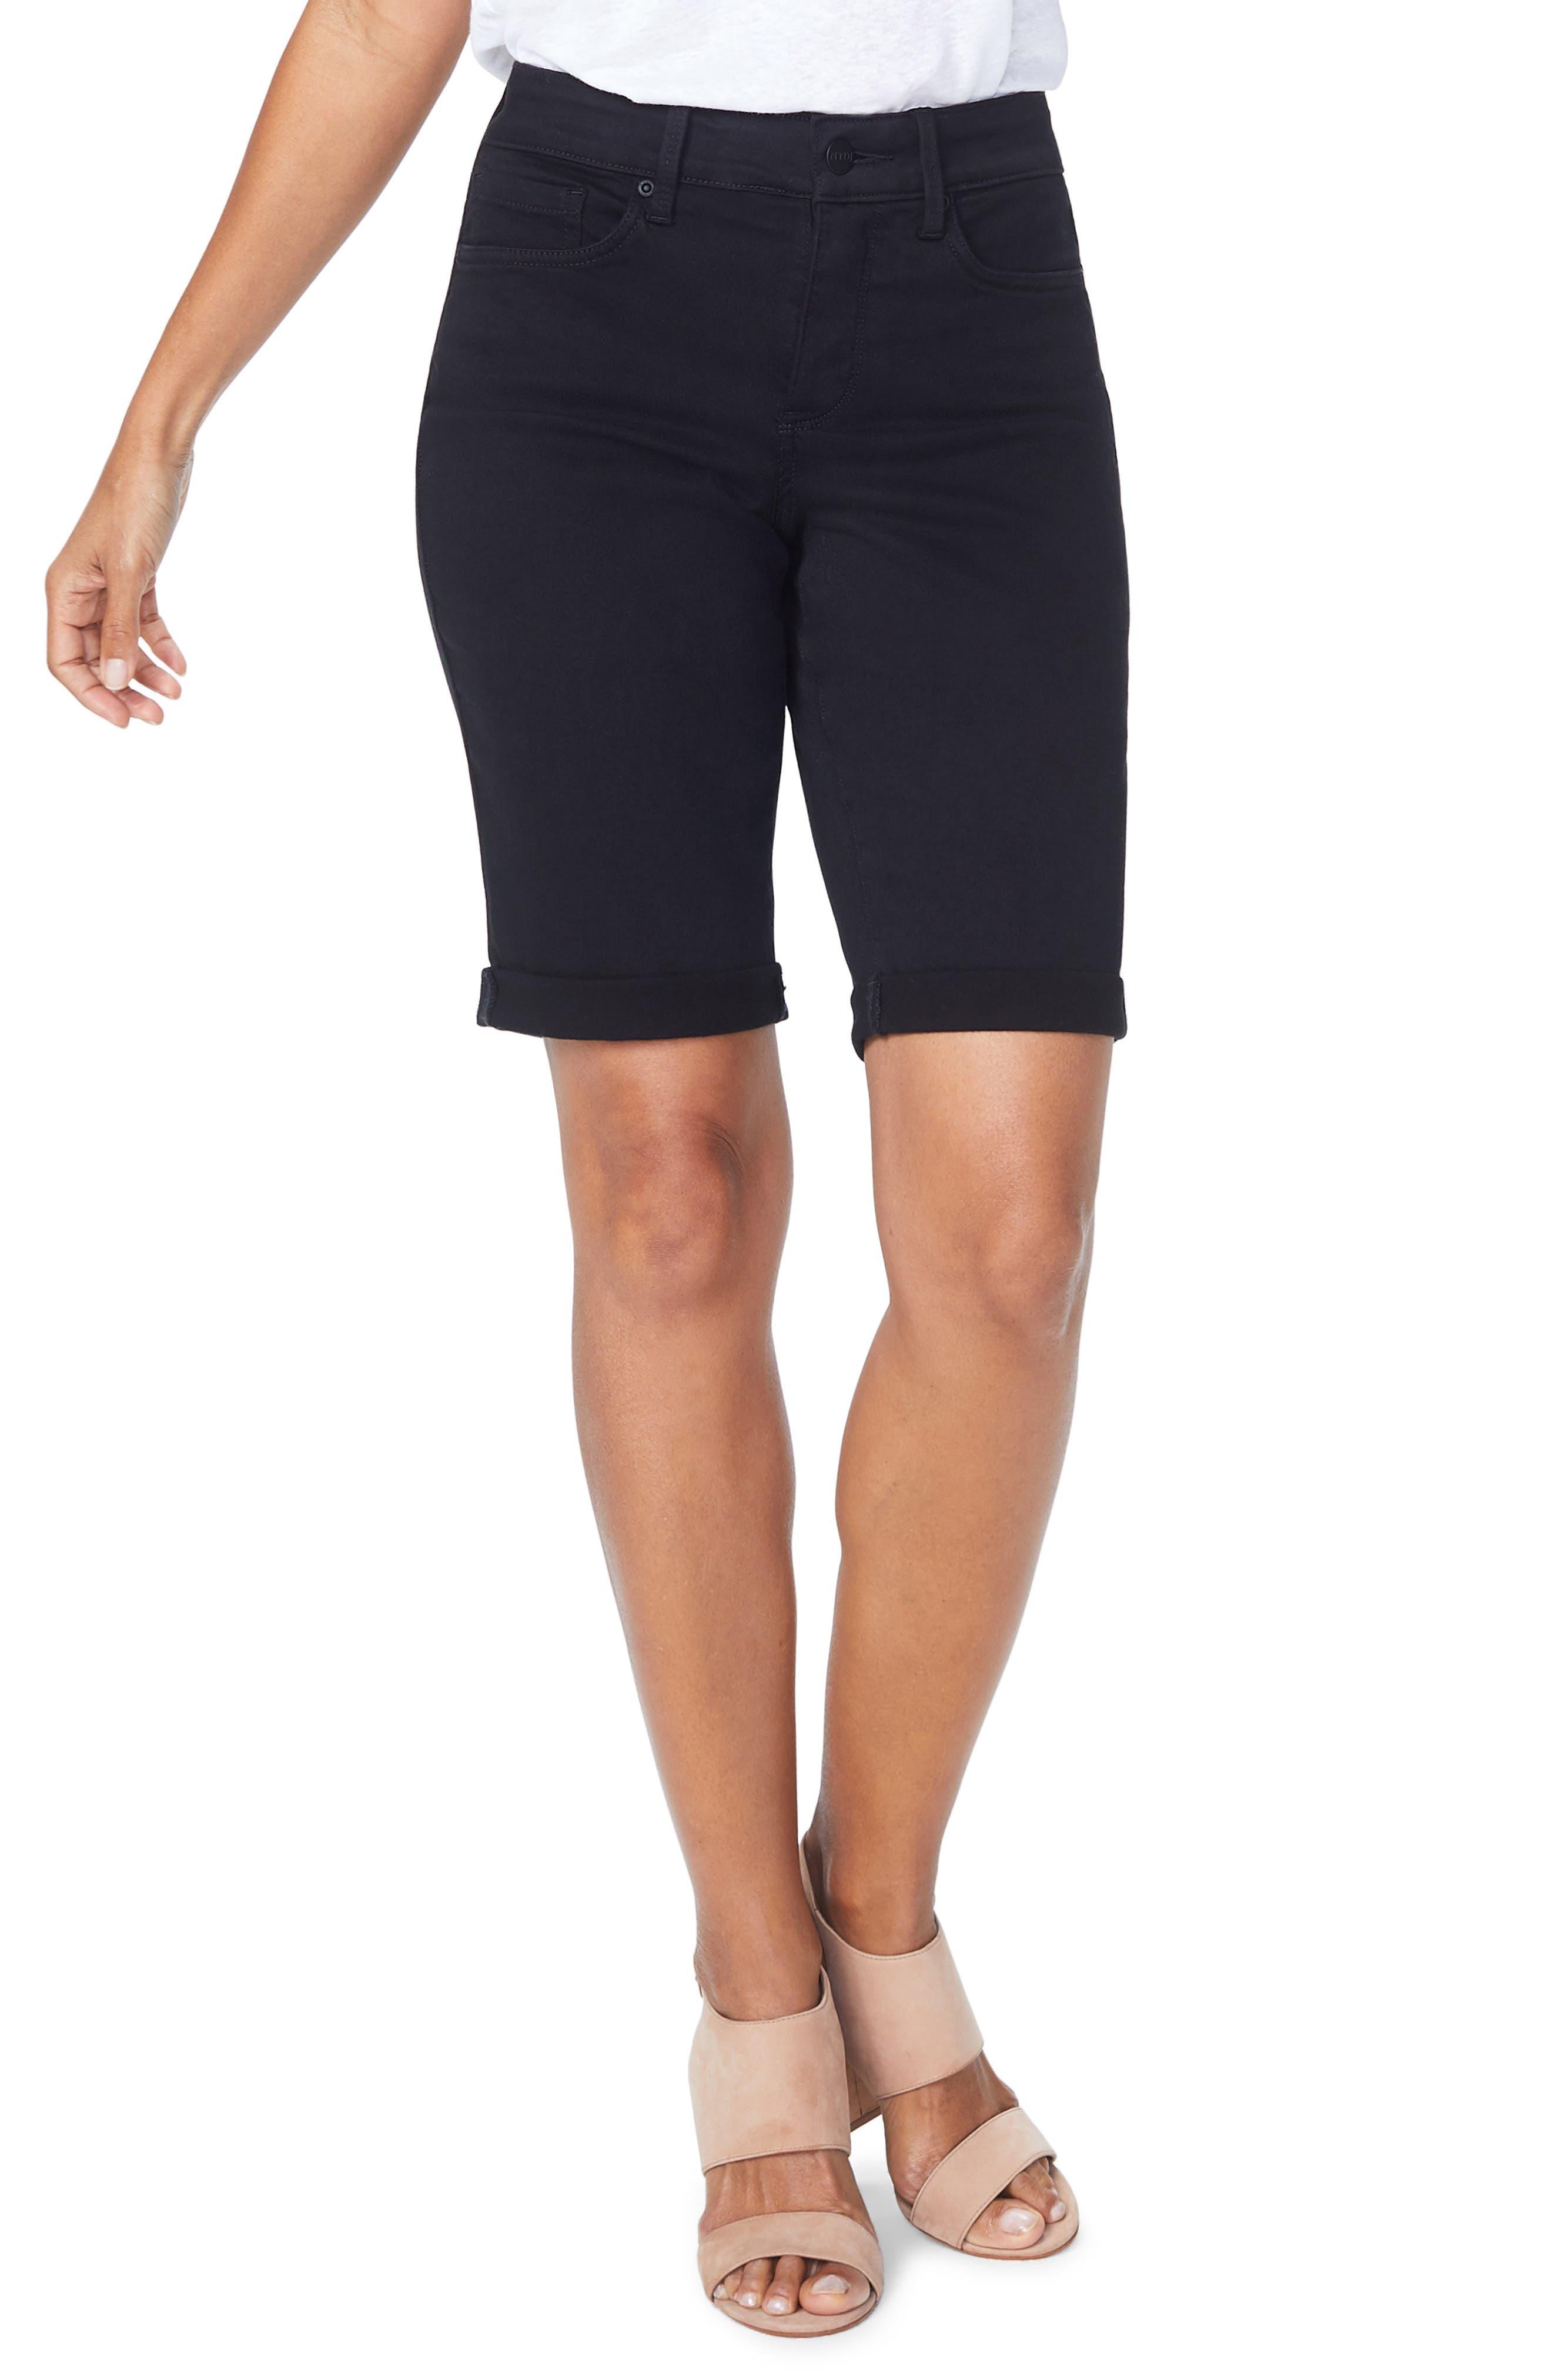 Briella Roll Cuff Bermuda Shorts,                             Main thumbnail 1, color,                             001